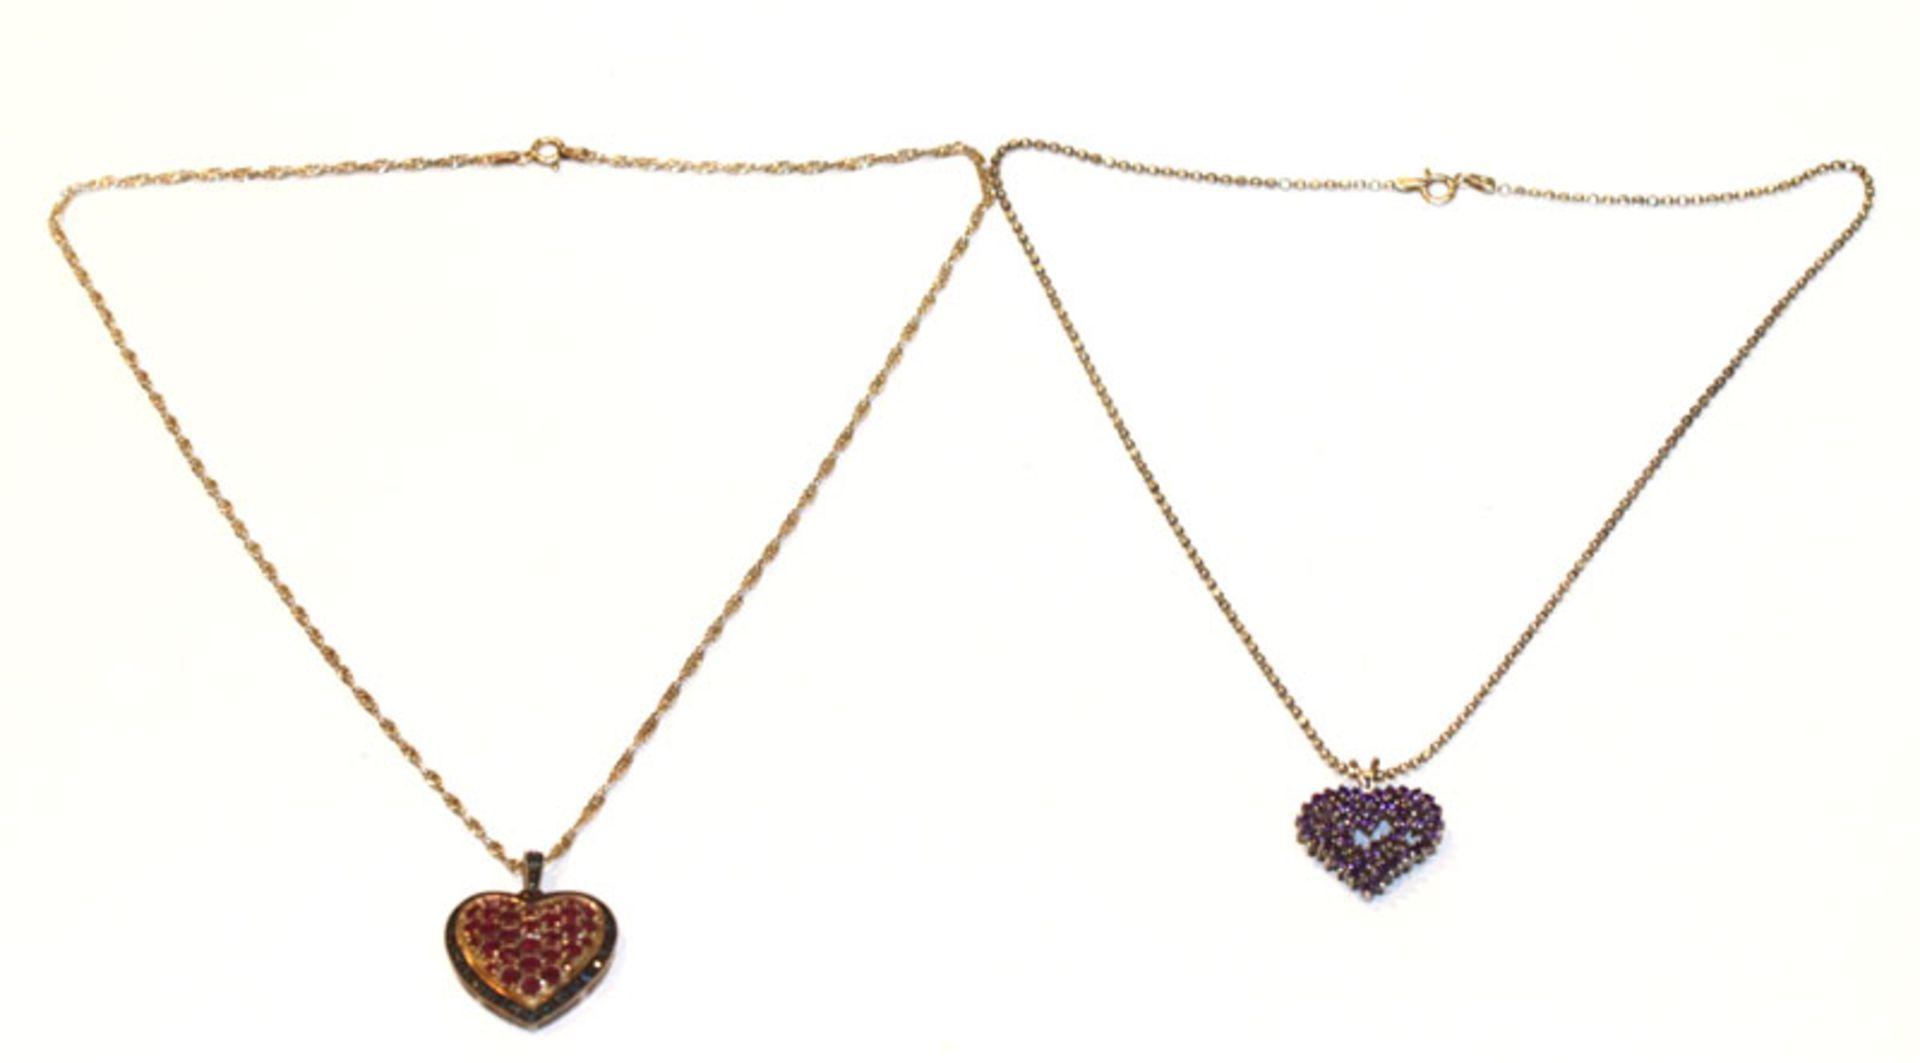 2 Silber Herzanhänger mit Farbsteinen an Silberketten, L 42/48 cm